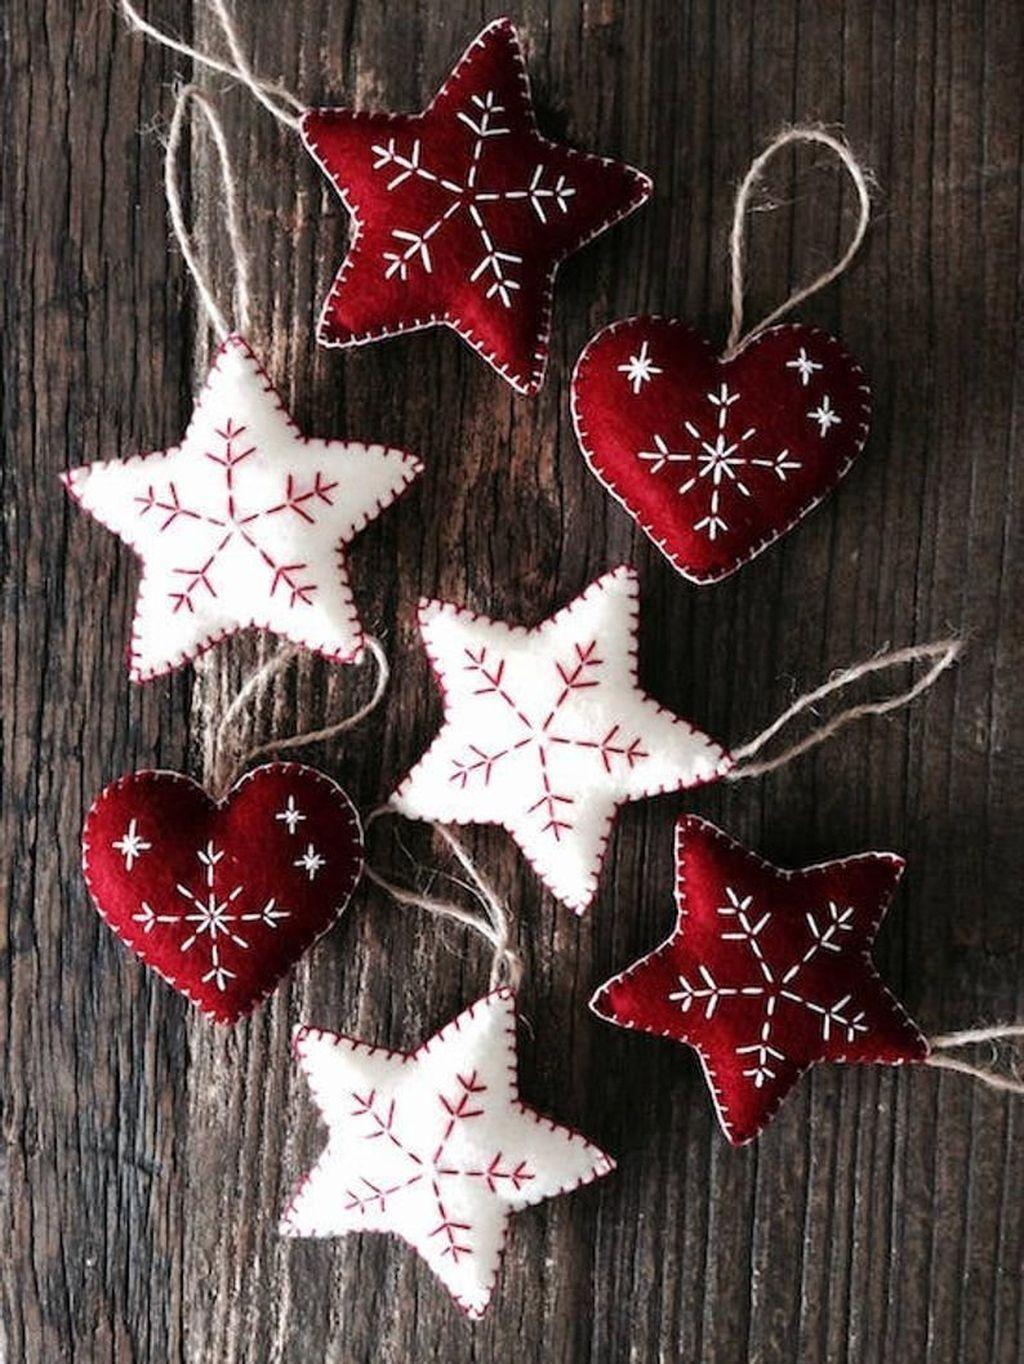 30 Pretty Scandinavian Style For Christmas Decoration Ideas Handmade Christmas Decorations Christmas Star Decorations Felt Christmas Decorations